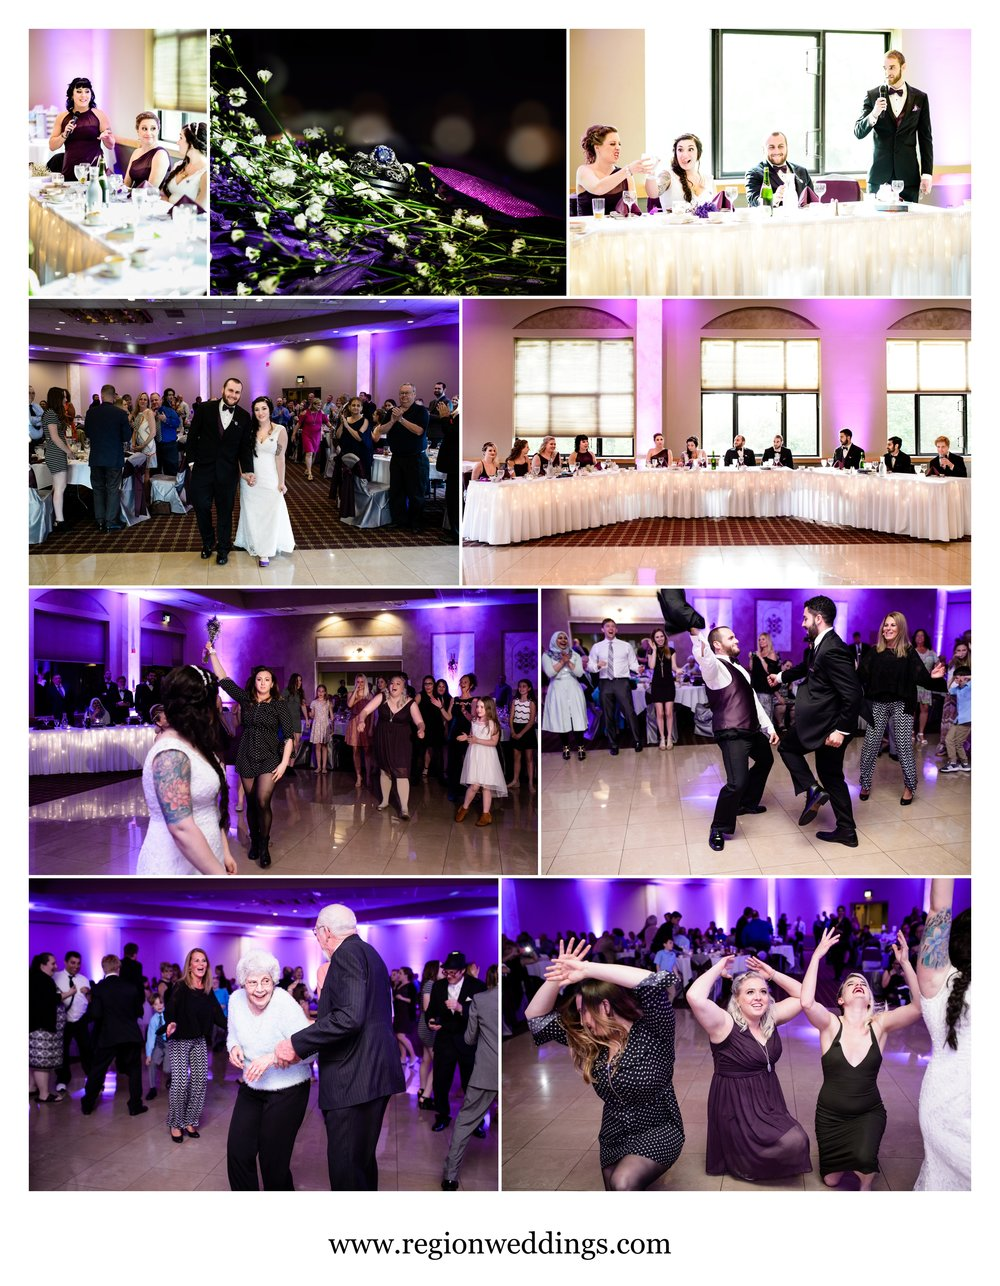 Spring wedding reception at Villa Cesare in Schererville, Indiana.